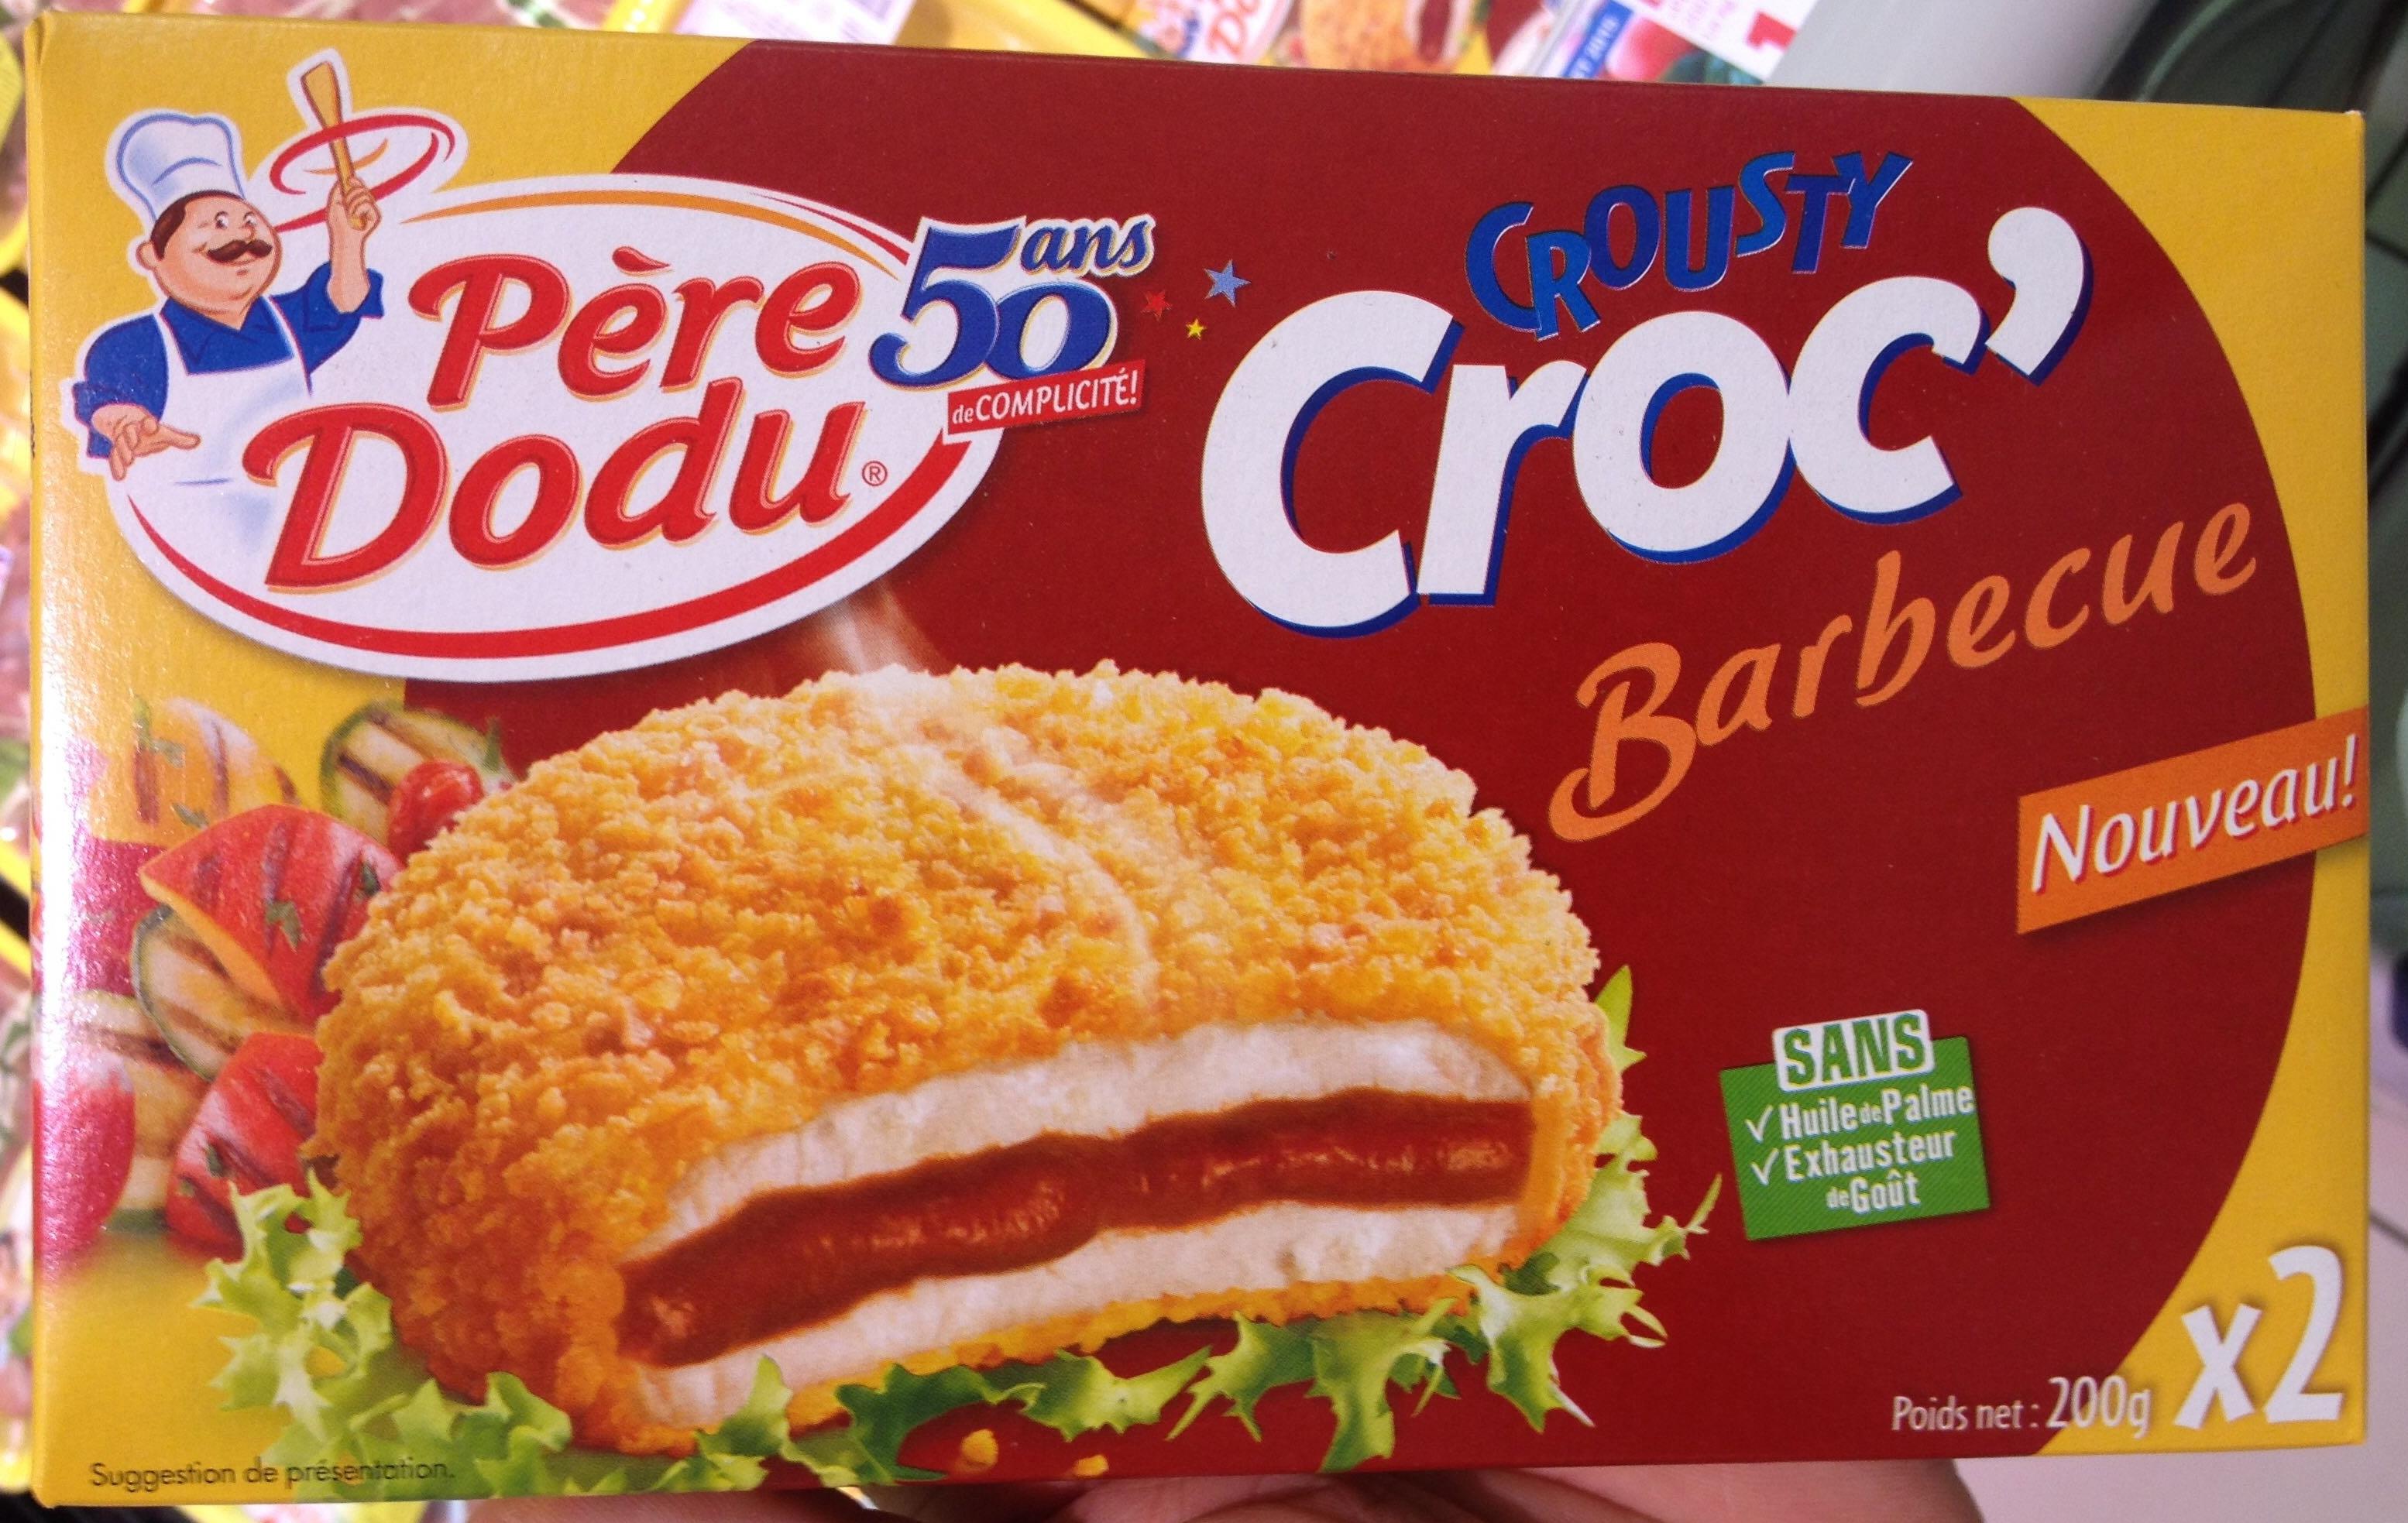 Crousty Croc' Barbecue (x 2) - Produit